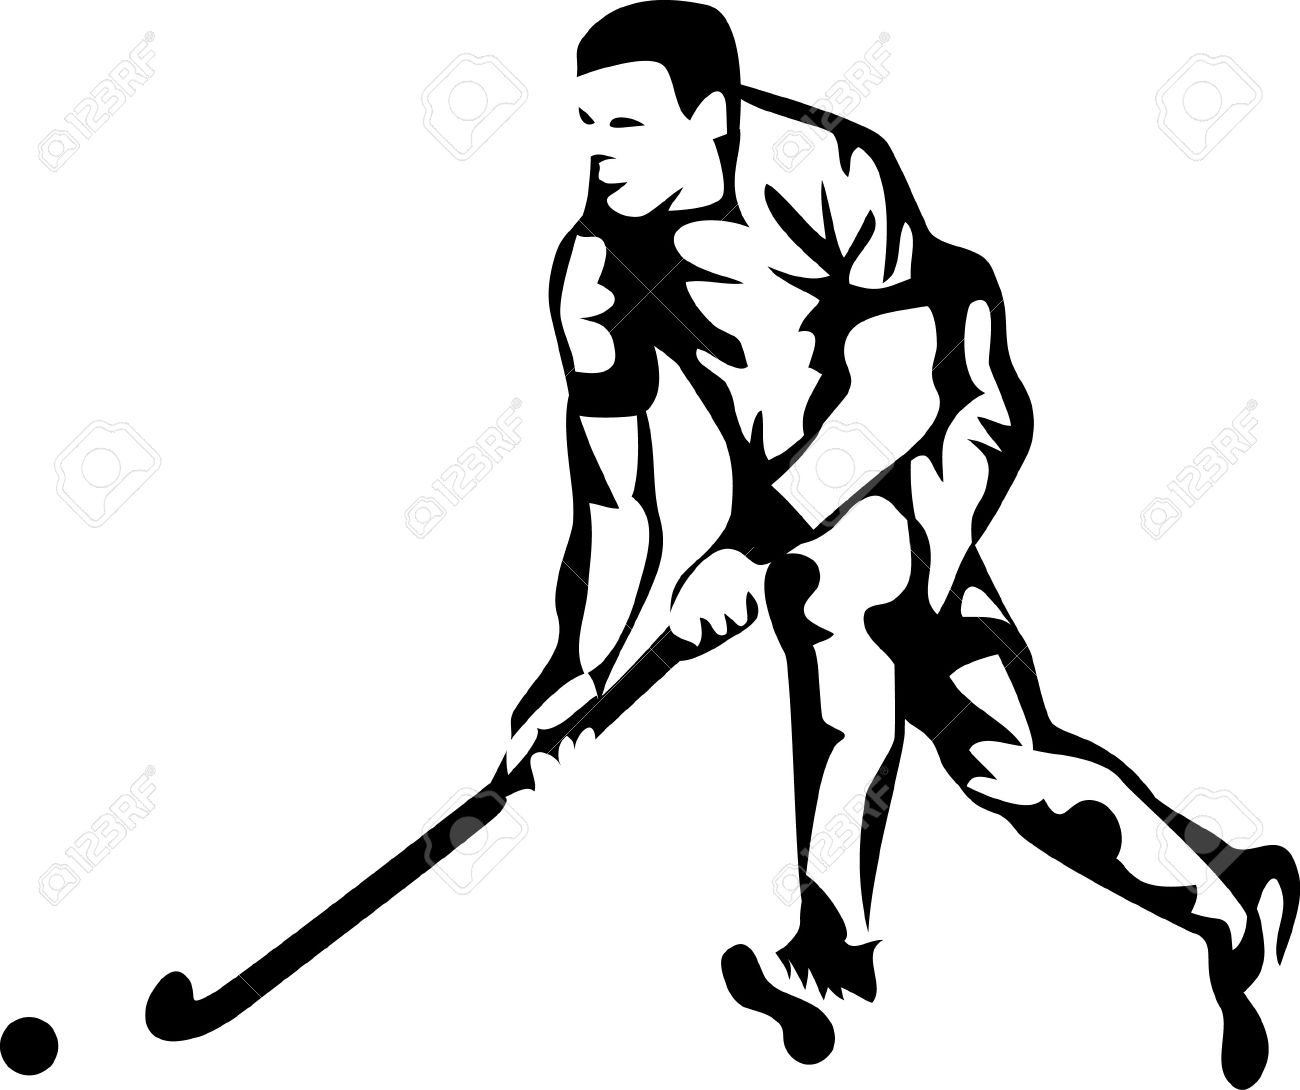 field hockey player logo.